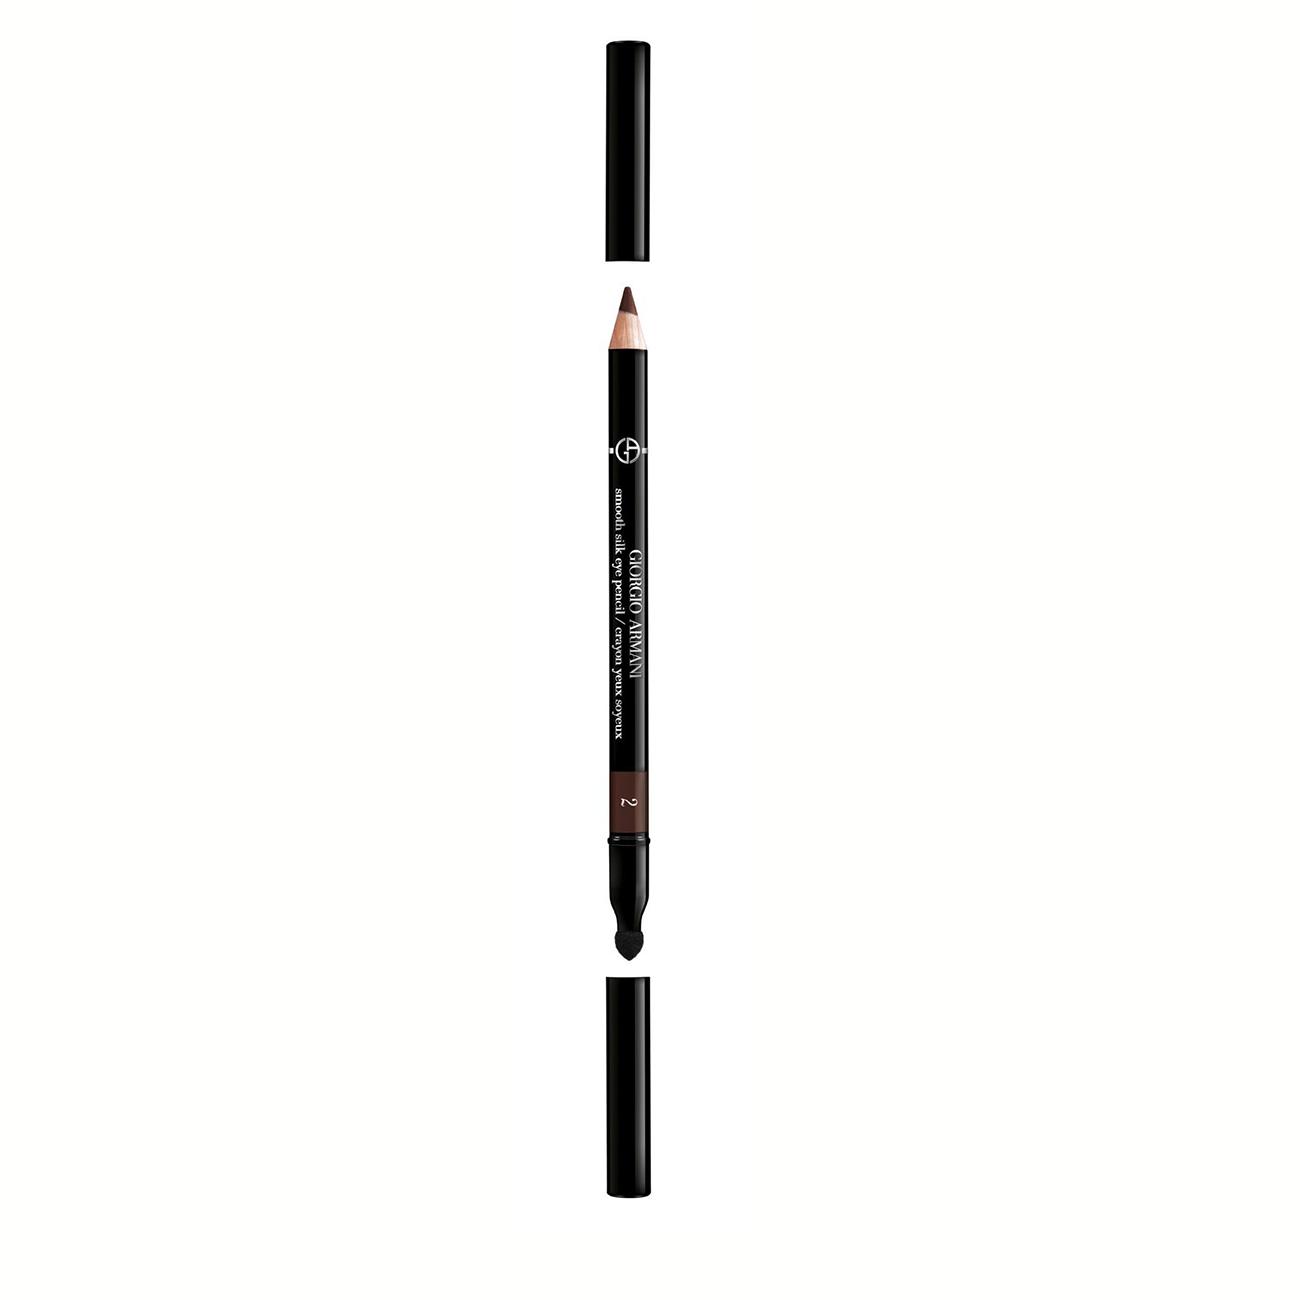 Smooth Silk Eye Pencil 2 1.05gr Giorgio Armani imagine 2021 bestvalue.eu